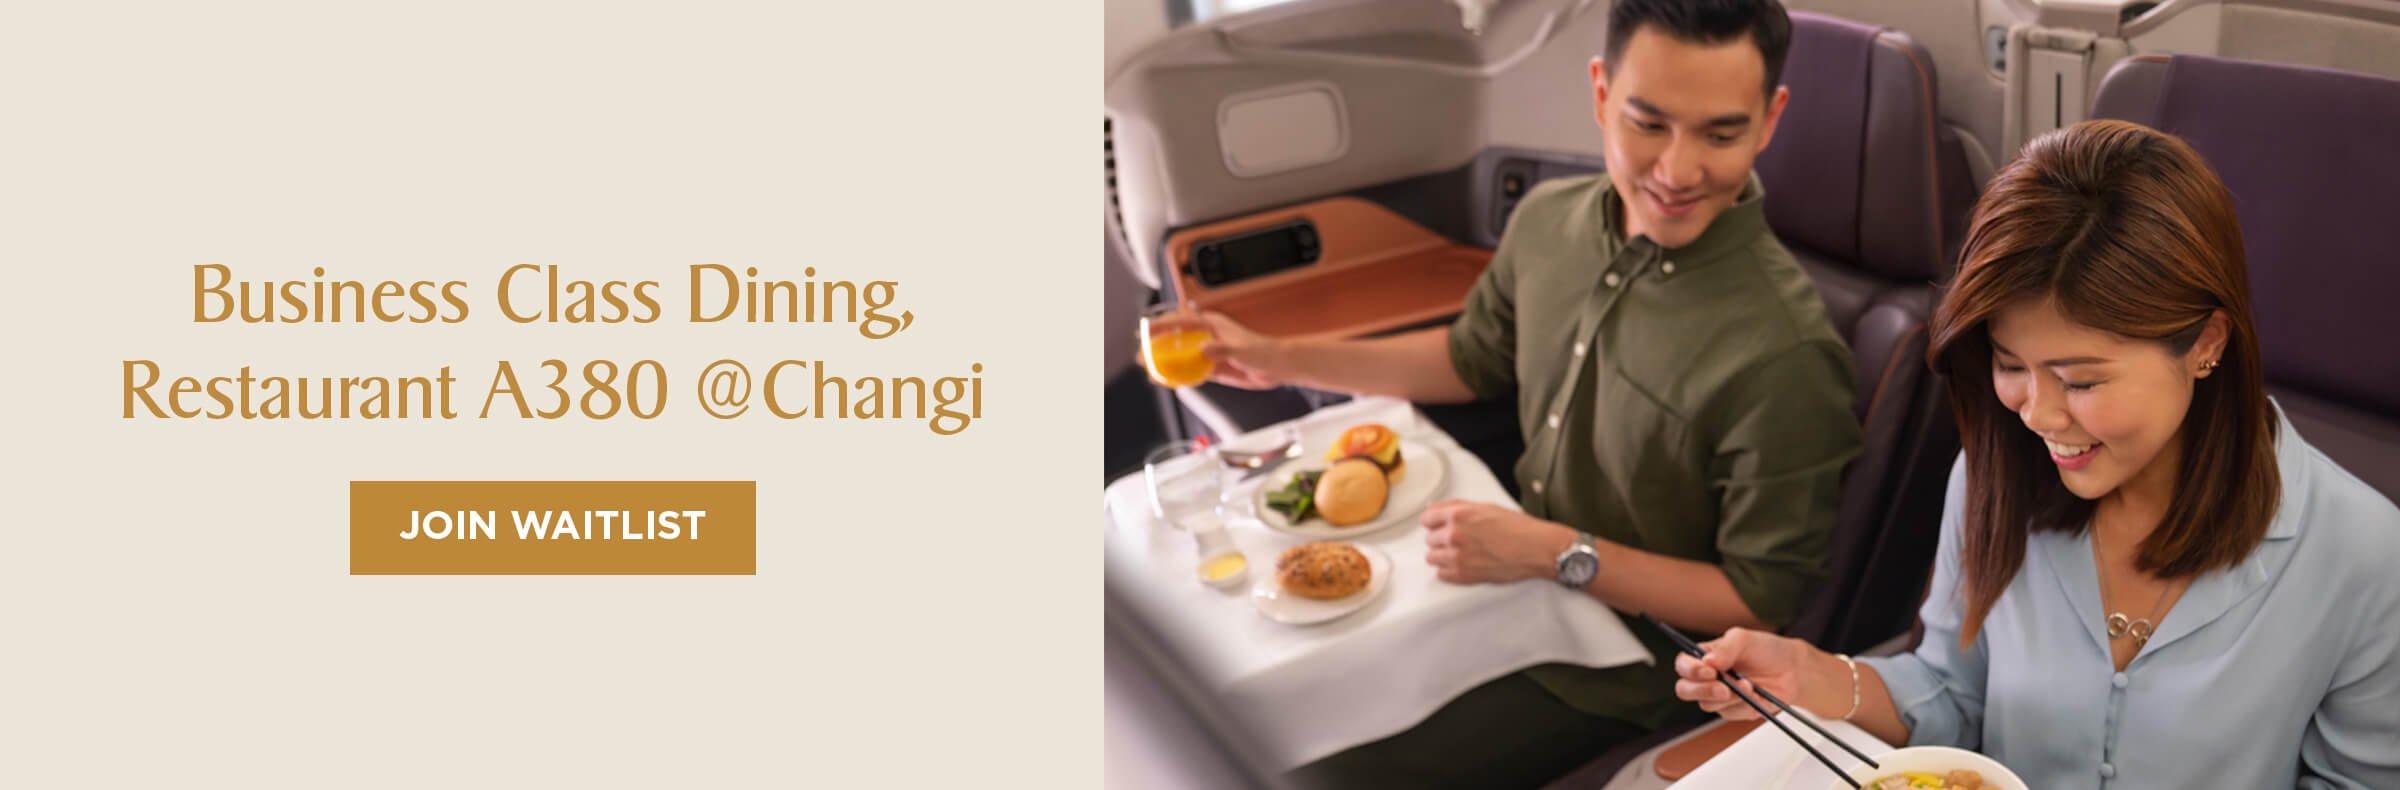 Business Class Dining, Restaurant A380 @Changi